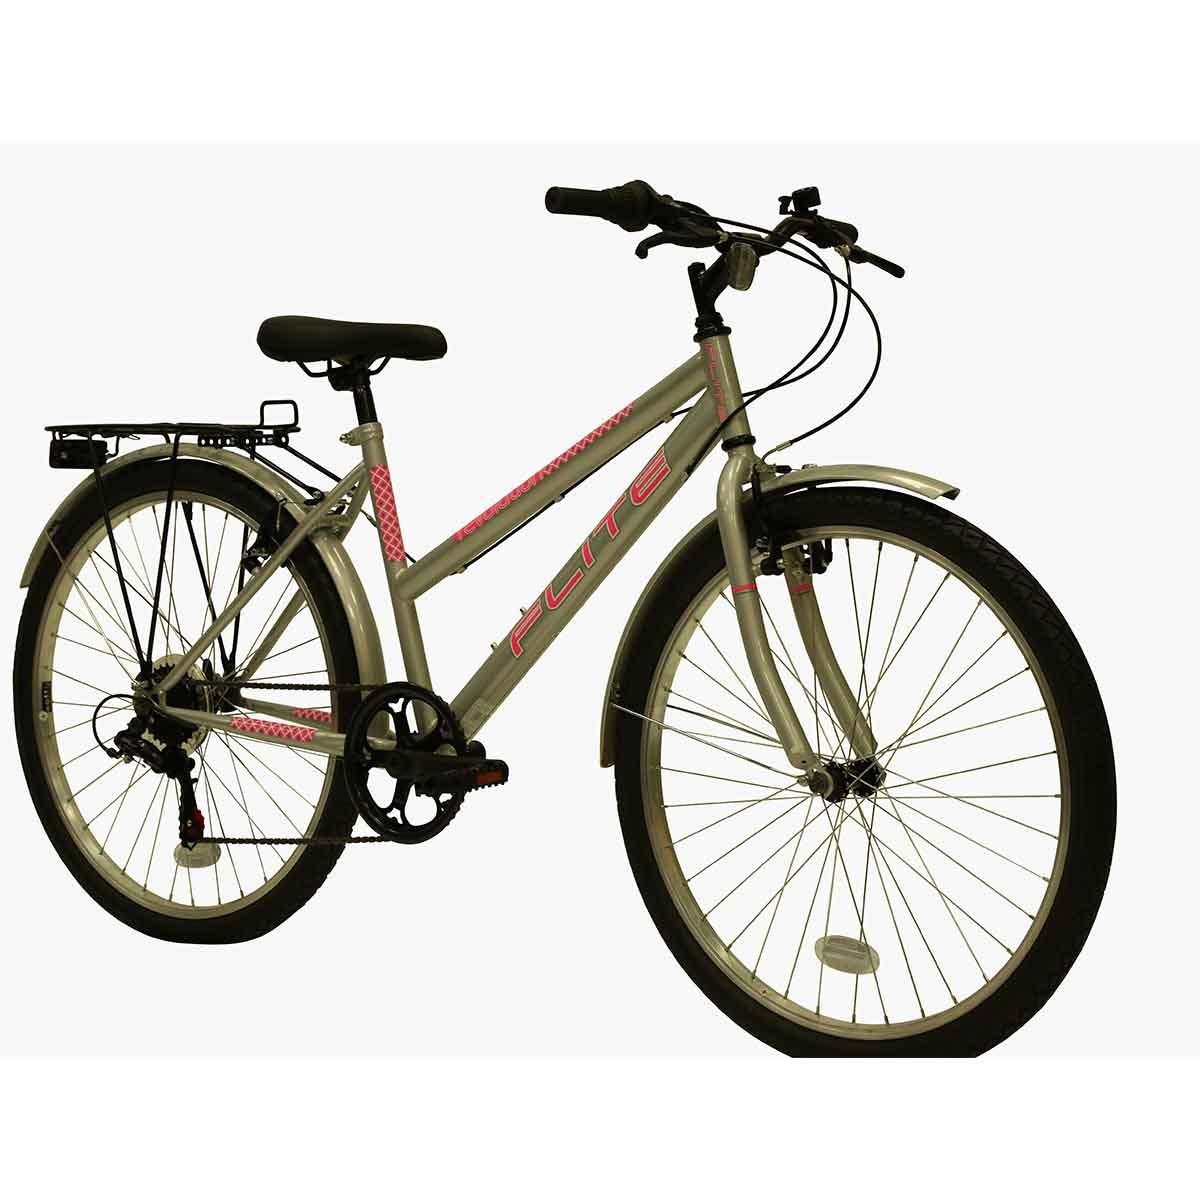 Flite Revolution 17 inch Ladies Hybrid Bike